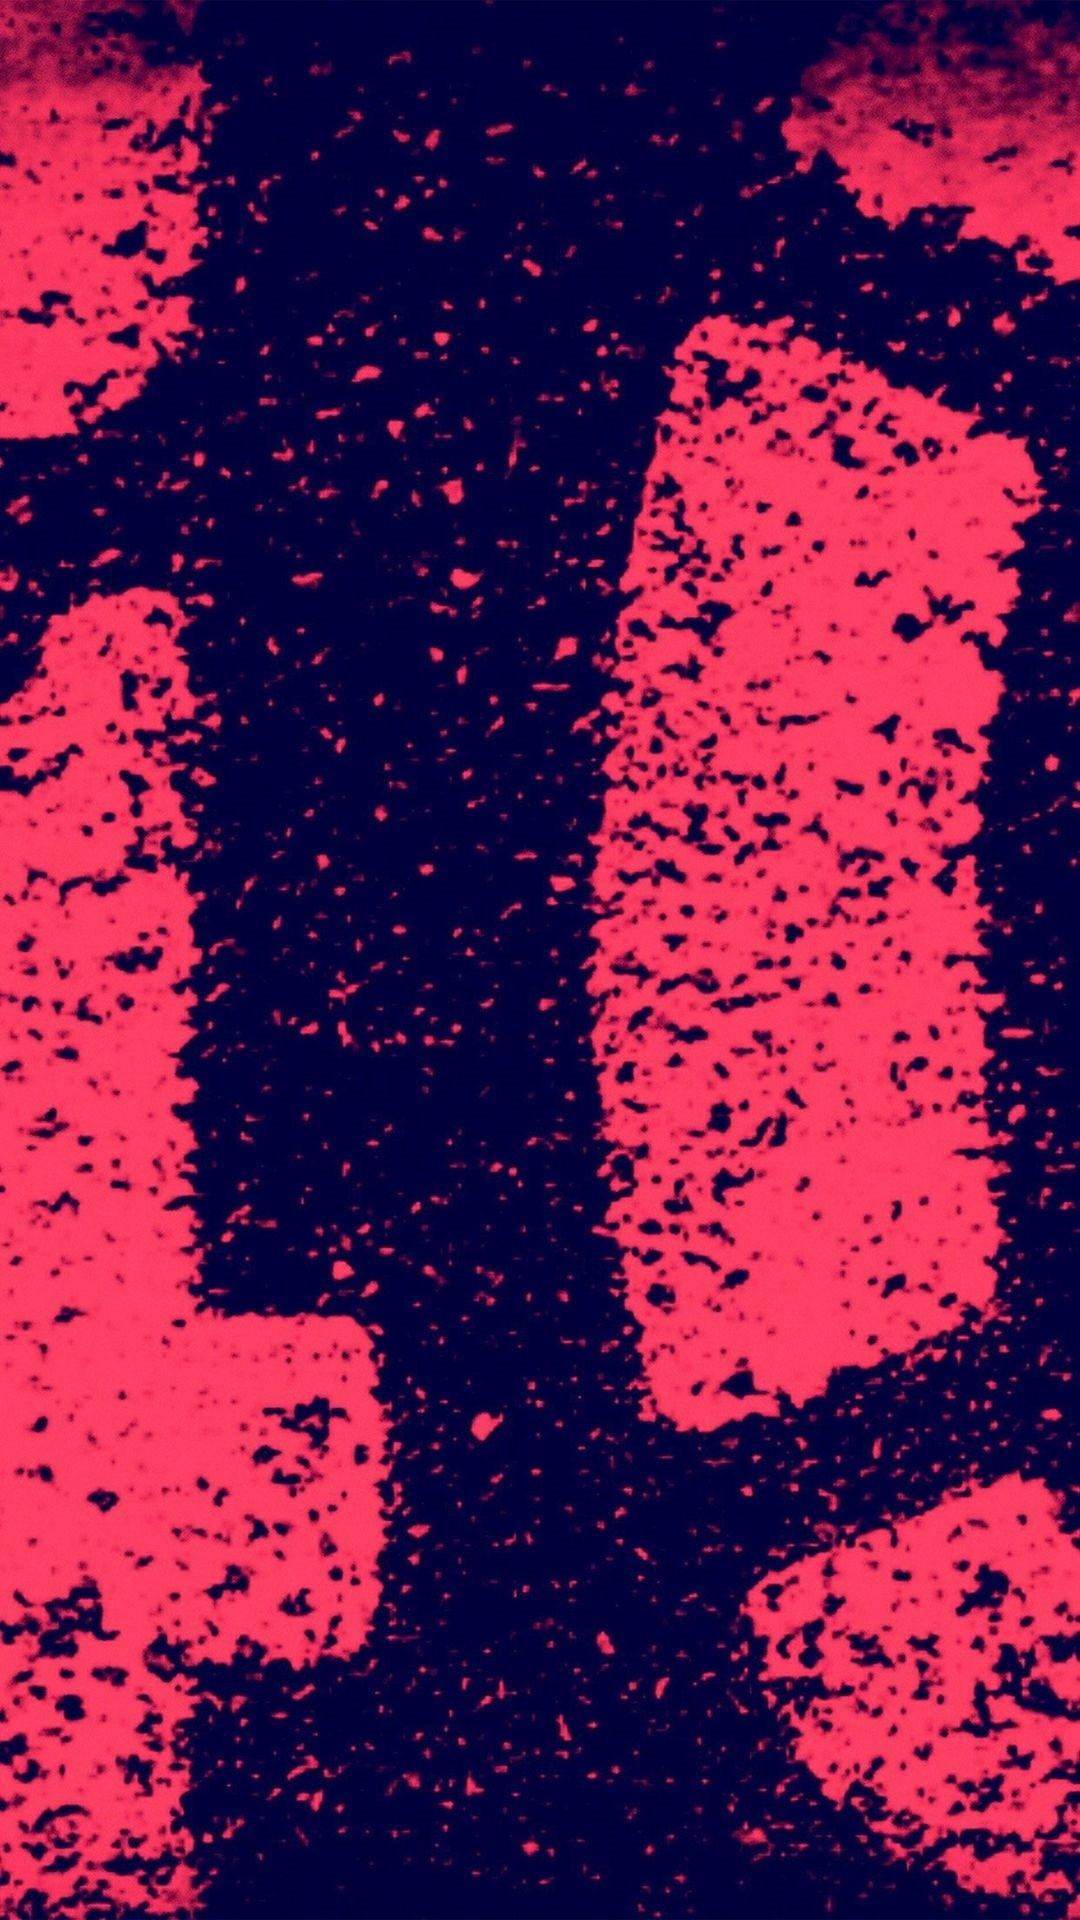 Grunge iphone wallpaper